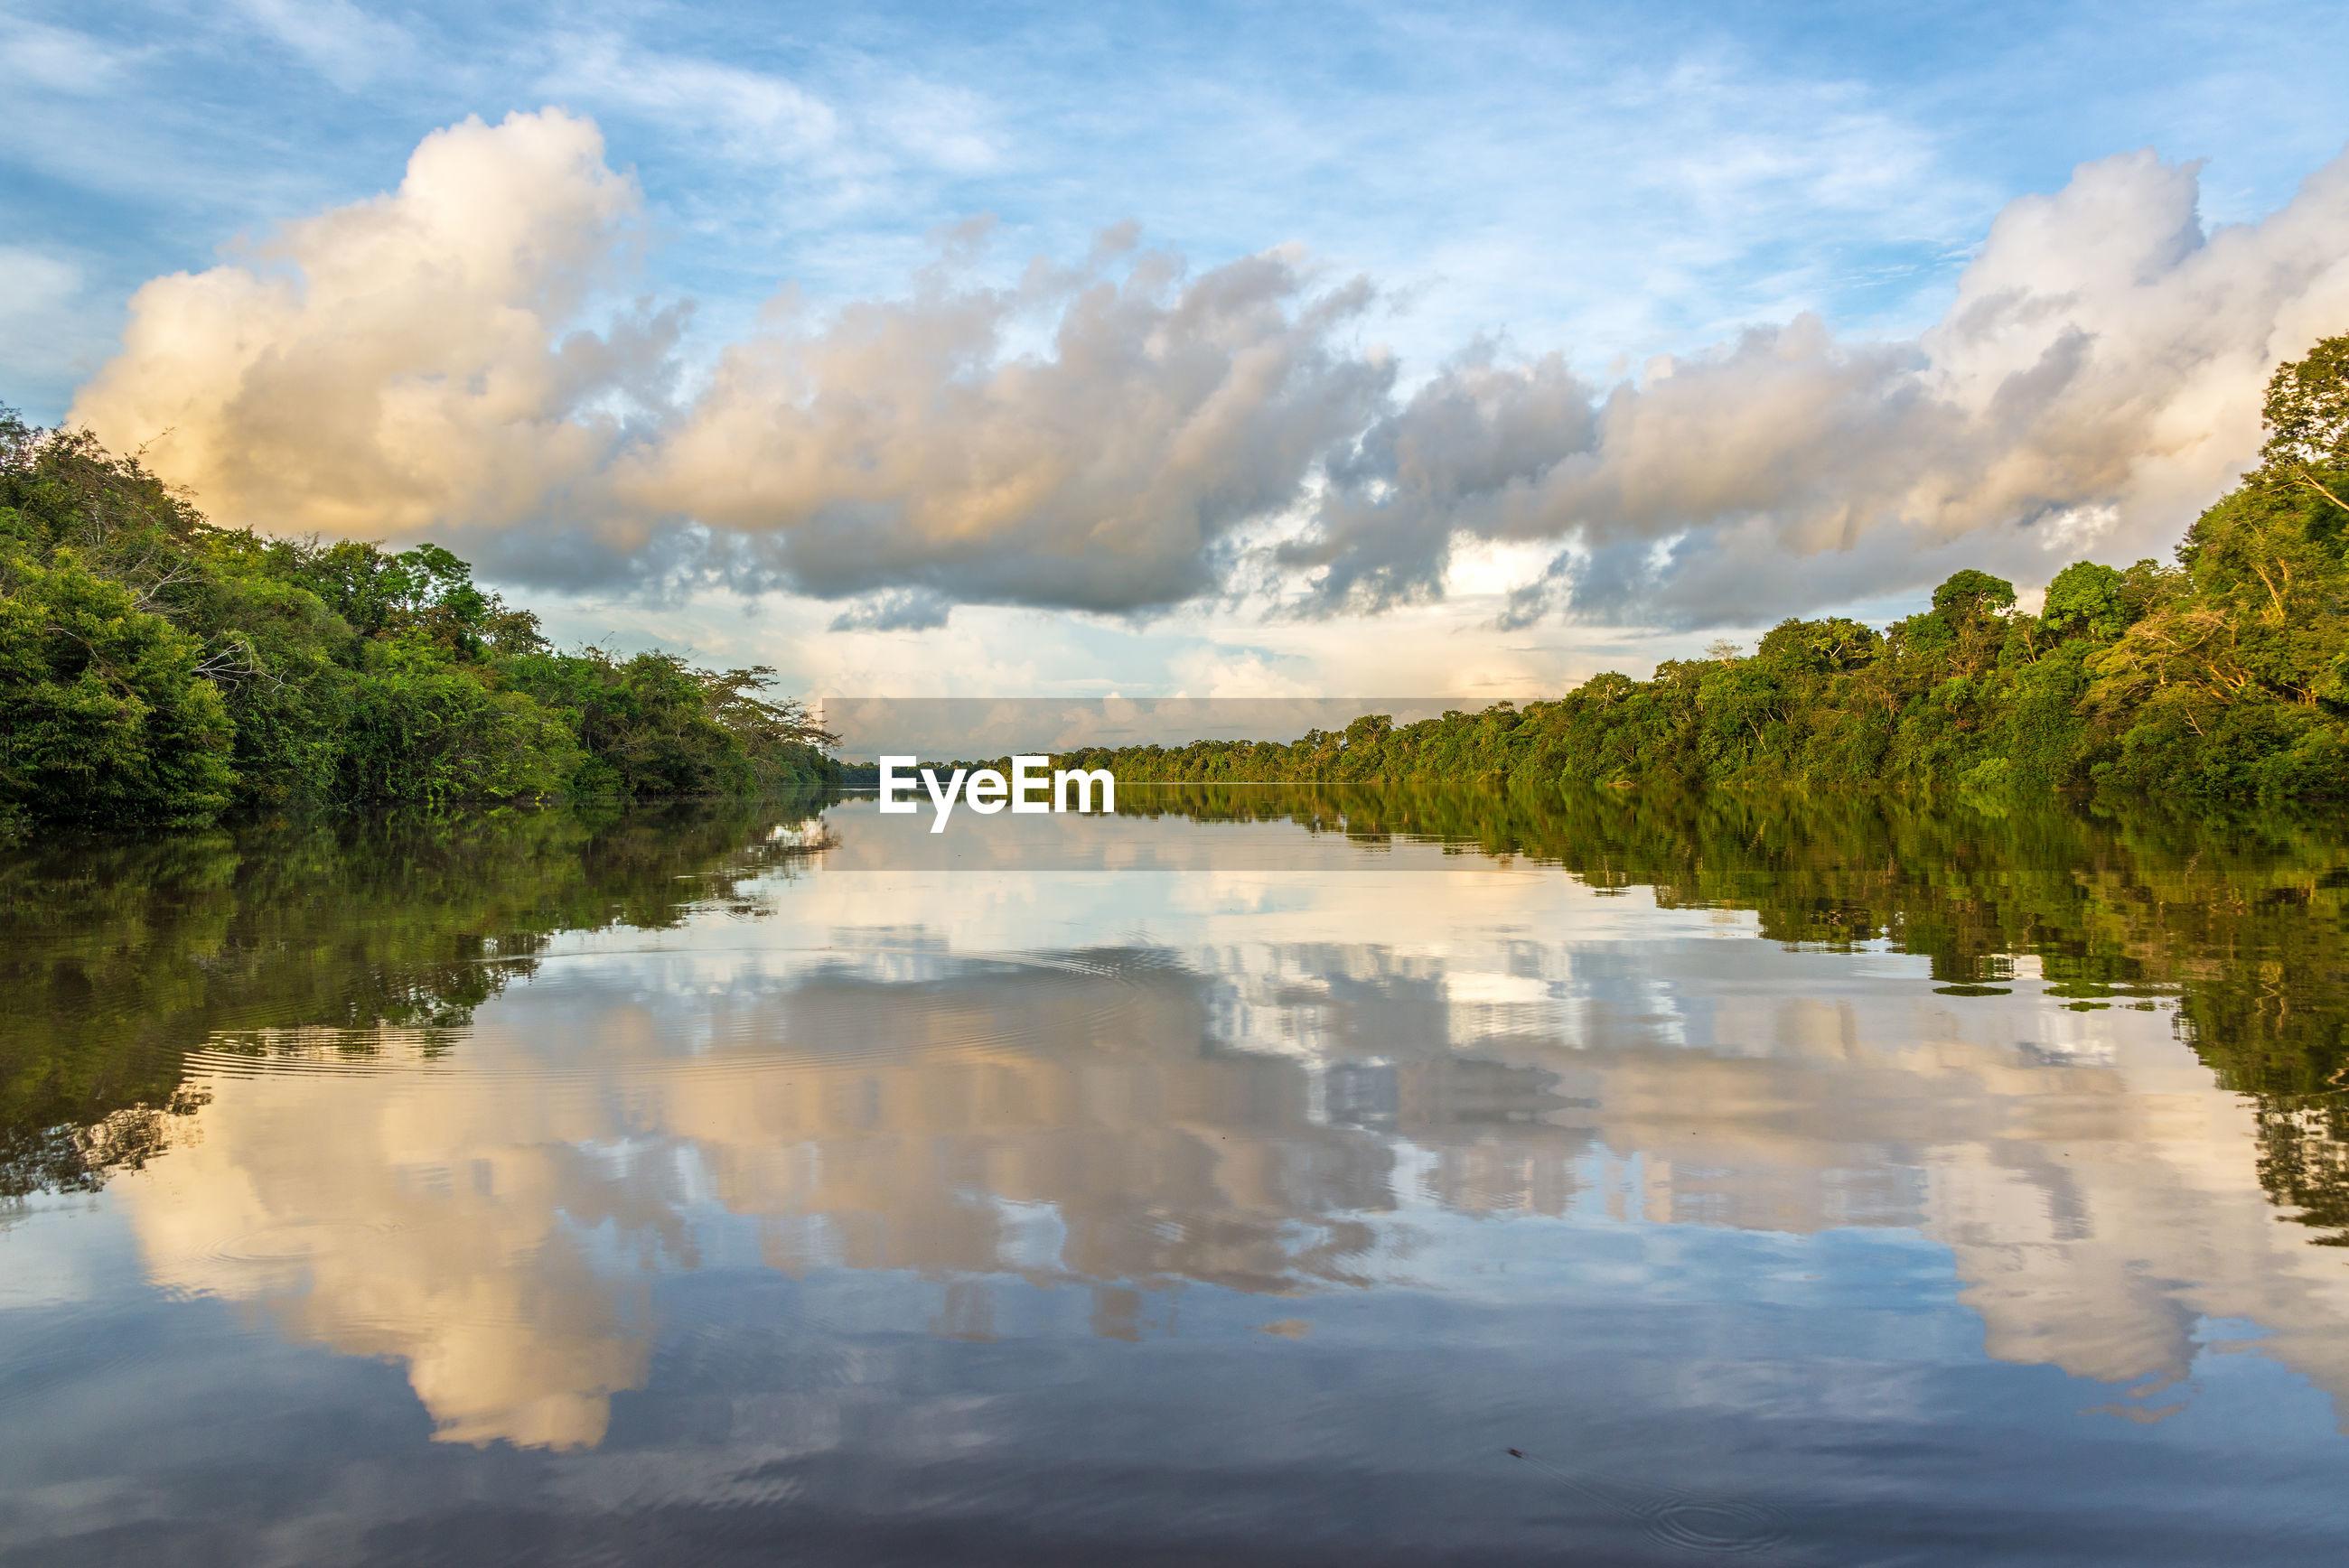 Javary river amidst amazon rainforest against cloudy sky